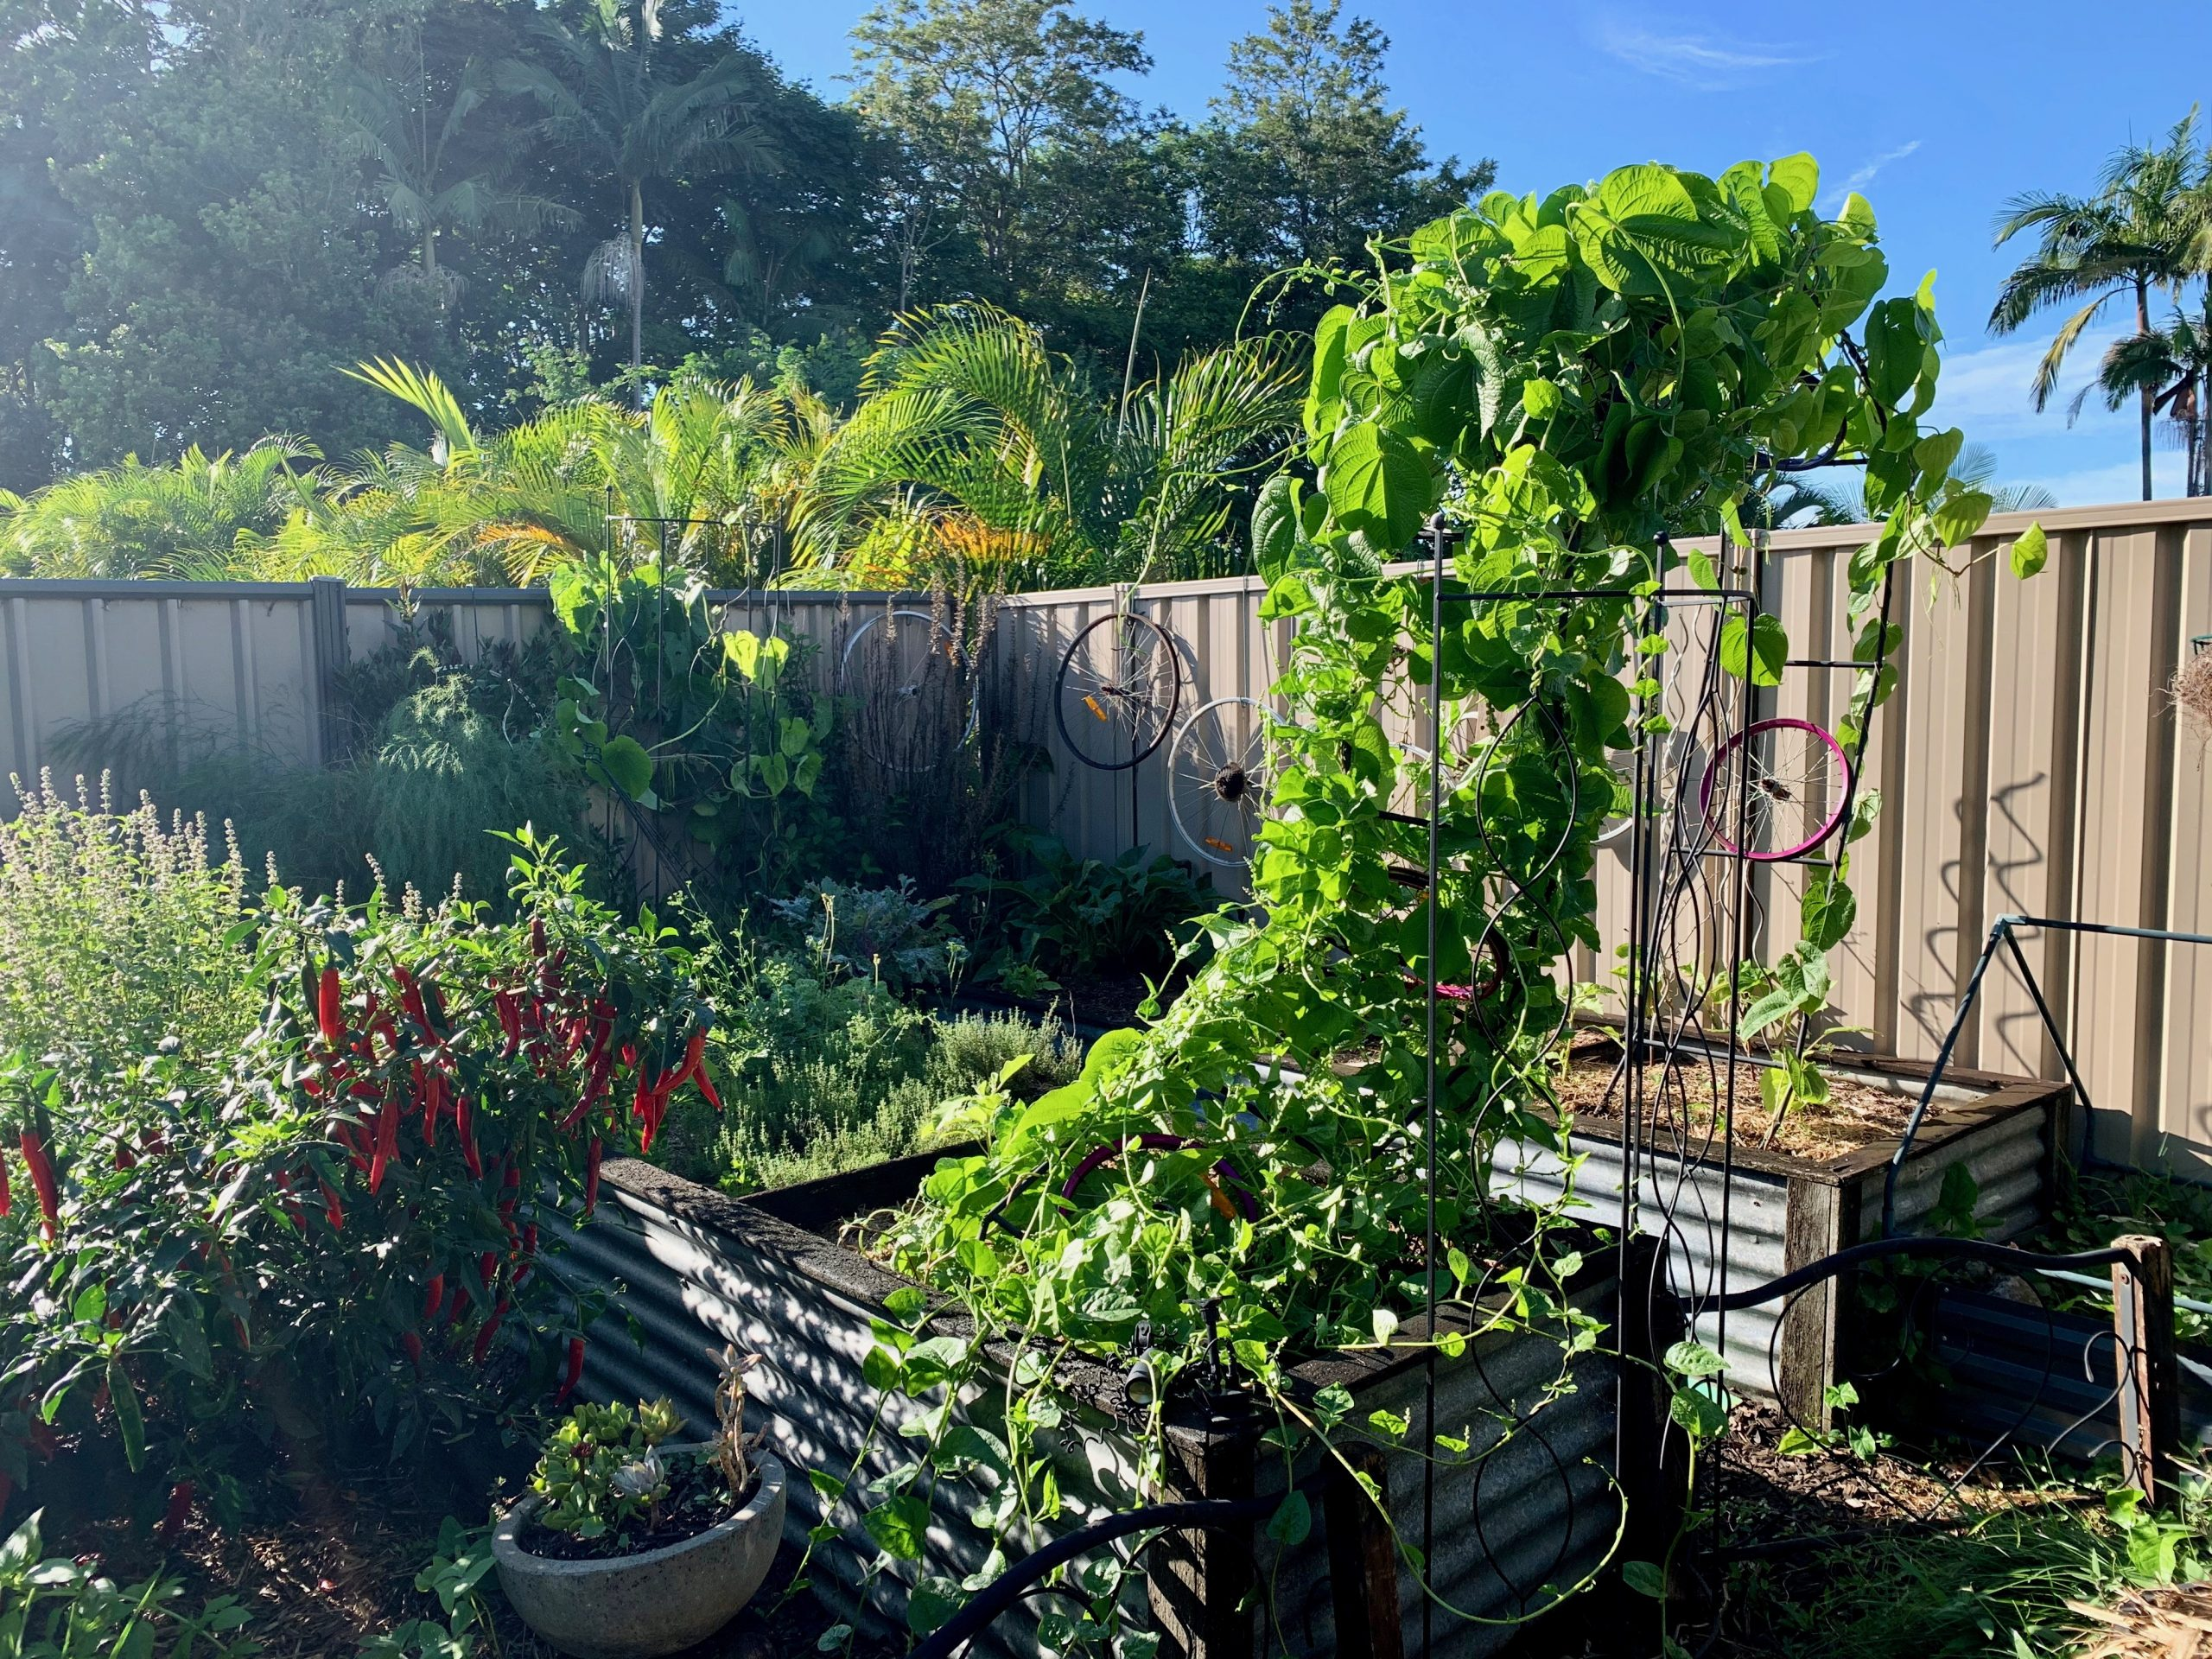 Malabar spinach growing up an arch